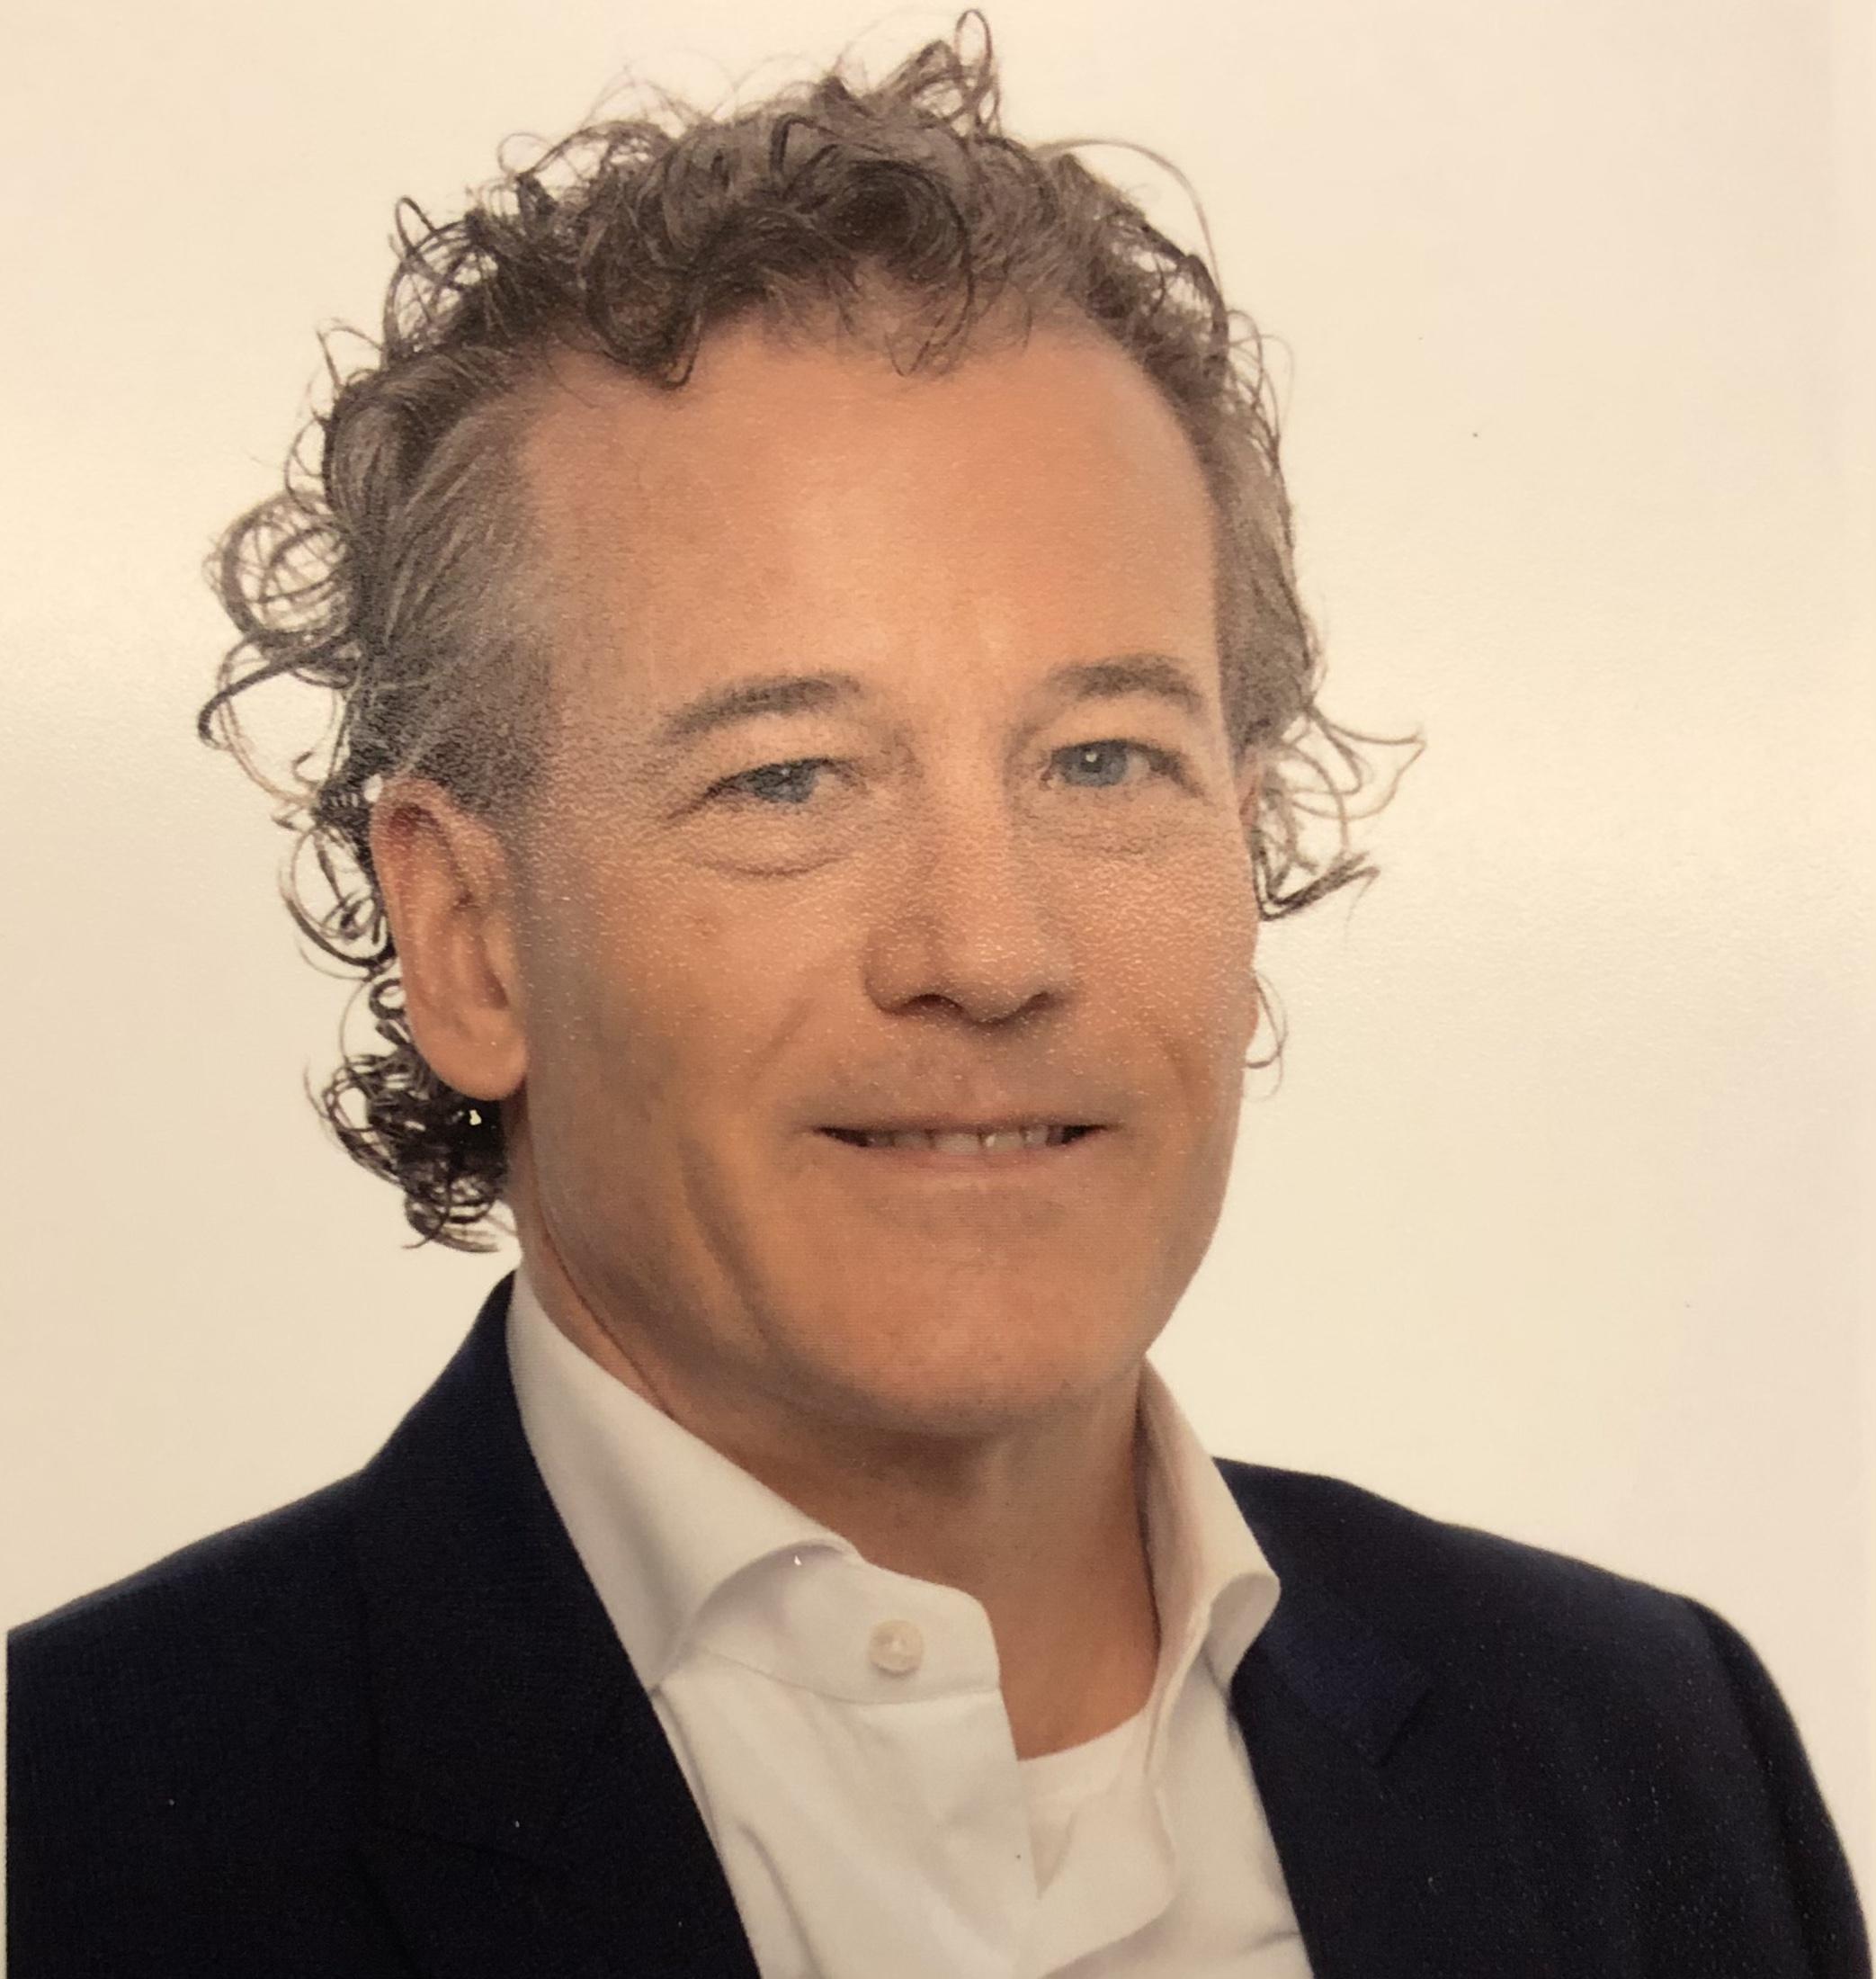 STRUCTeam has appointed Dr Joseph Laux as Senior Technical Advisor